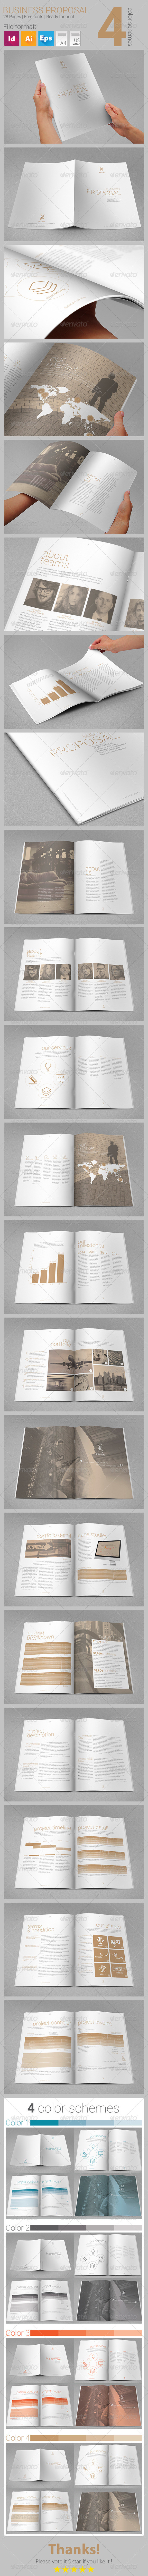 GraphicRiver Proposal XimXon 8746570